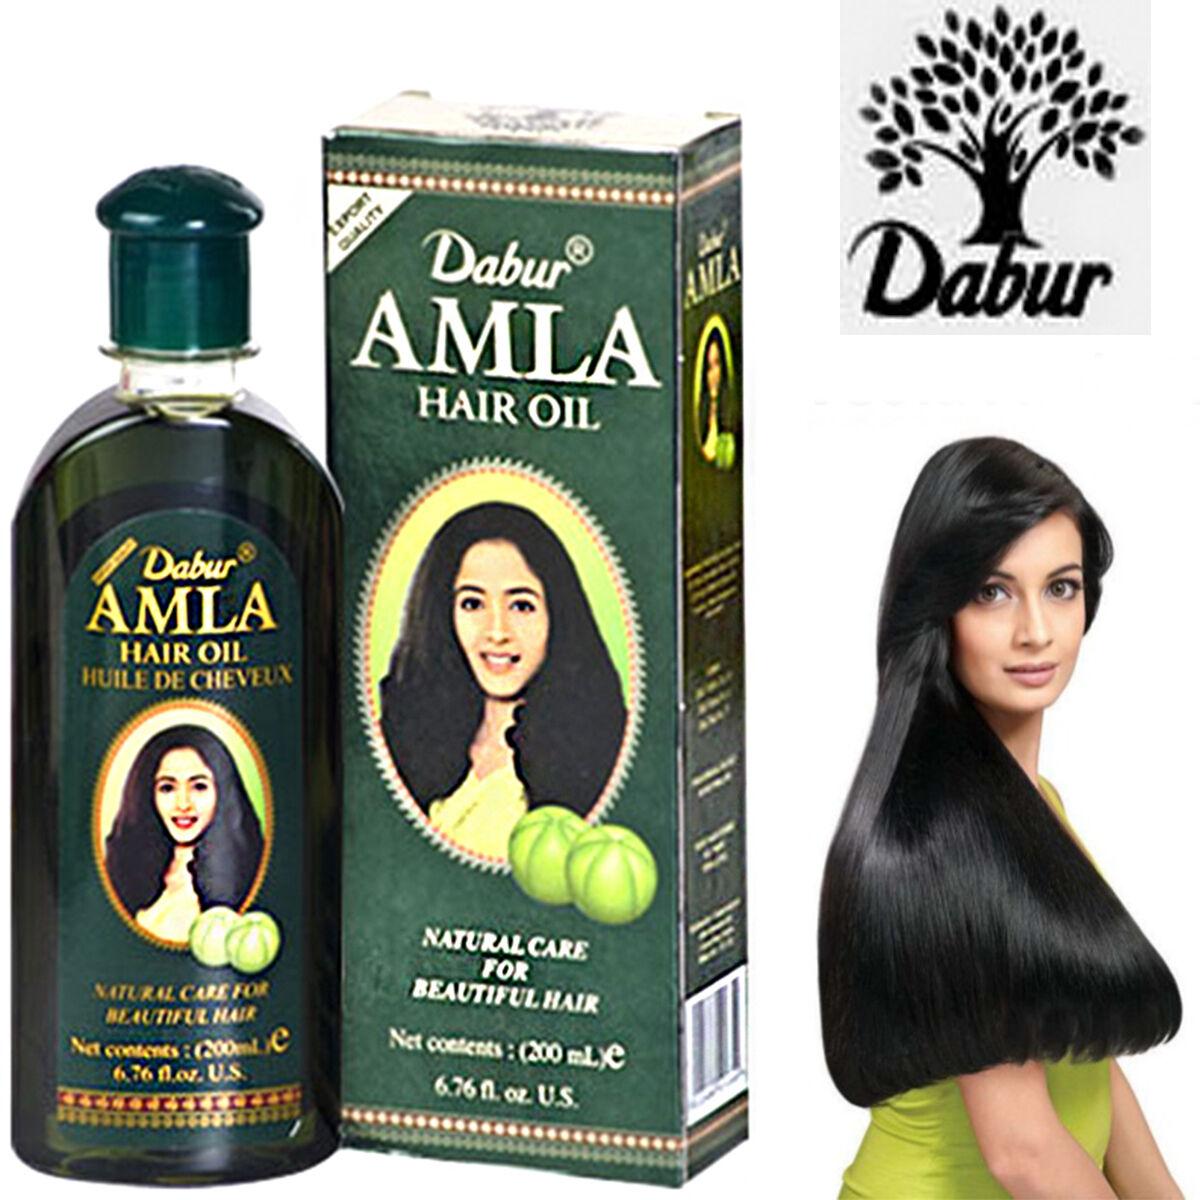 Dabur Amla Hair Oil Rapid Hair Growth Nourishing Prevent